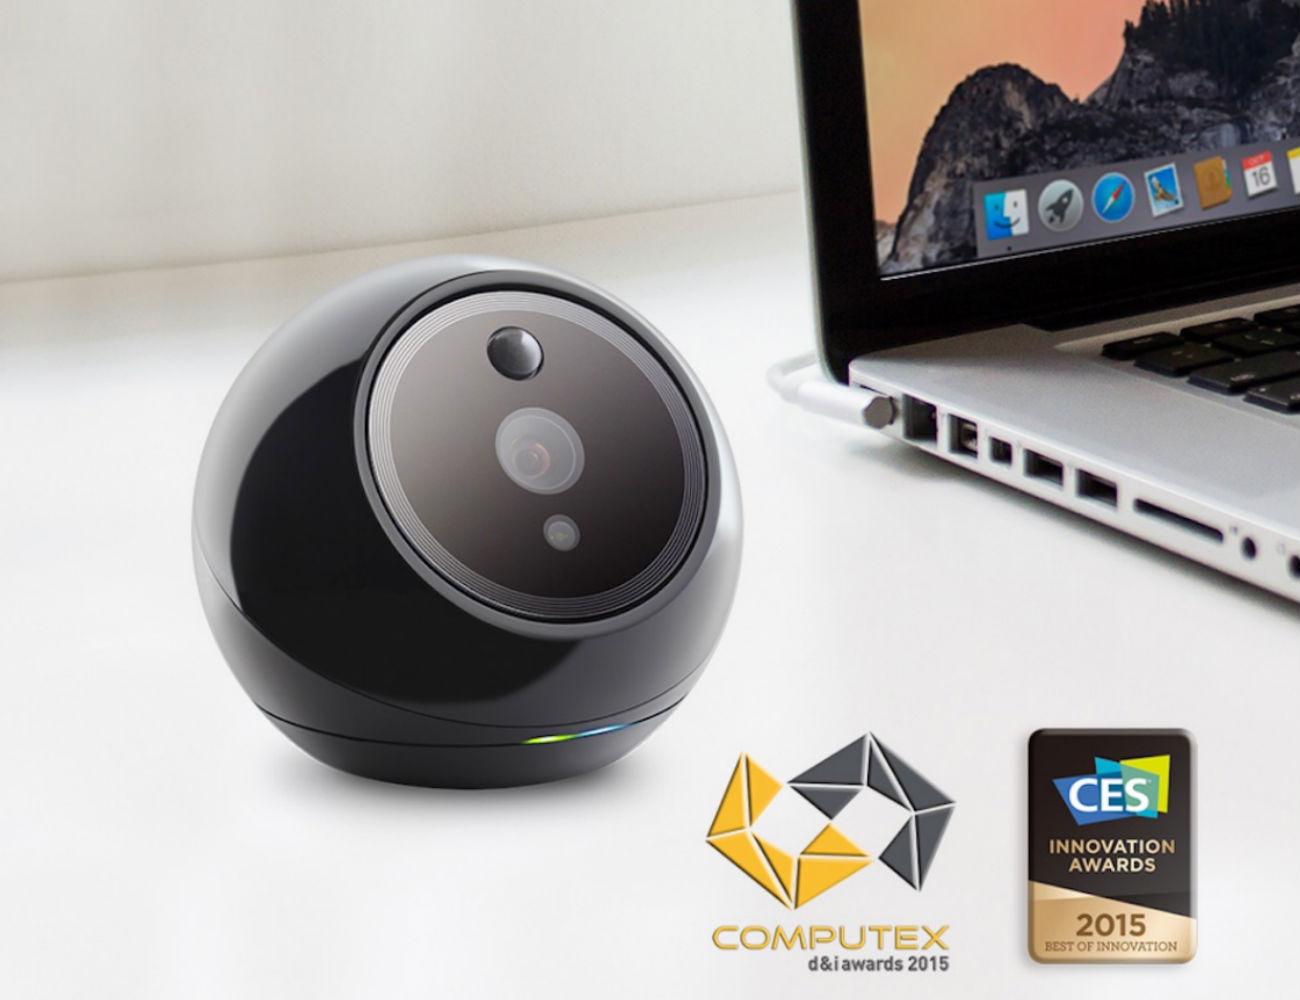 Amaryllo iCamPRO FHD Robotic Home Security Camera